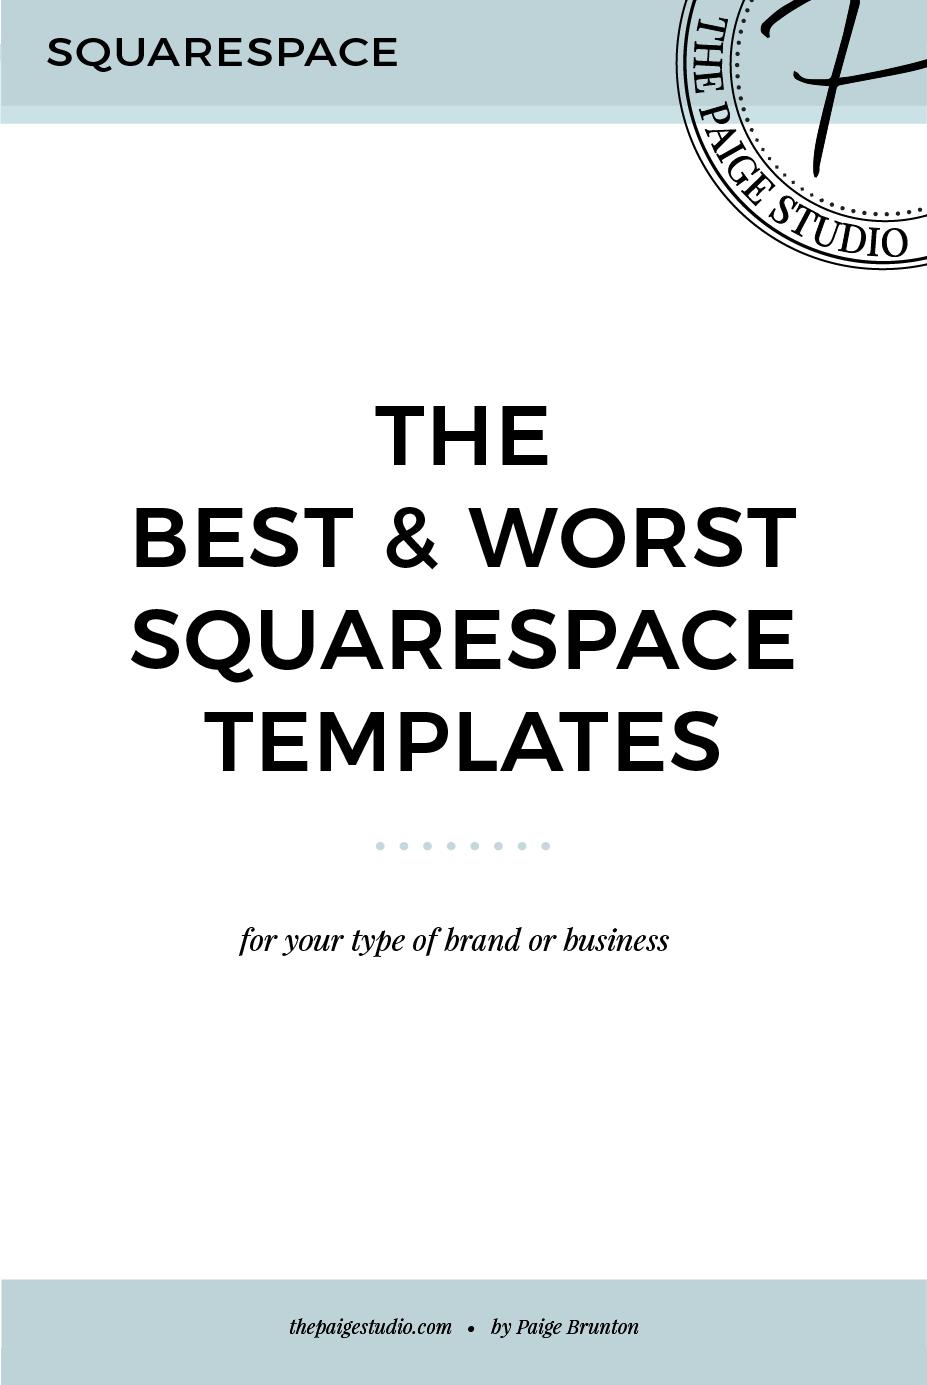 the best worst squarespace templates paige brunton. Black Bedroom Furniture Sets. Home Design Ideas